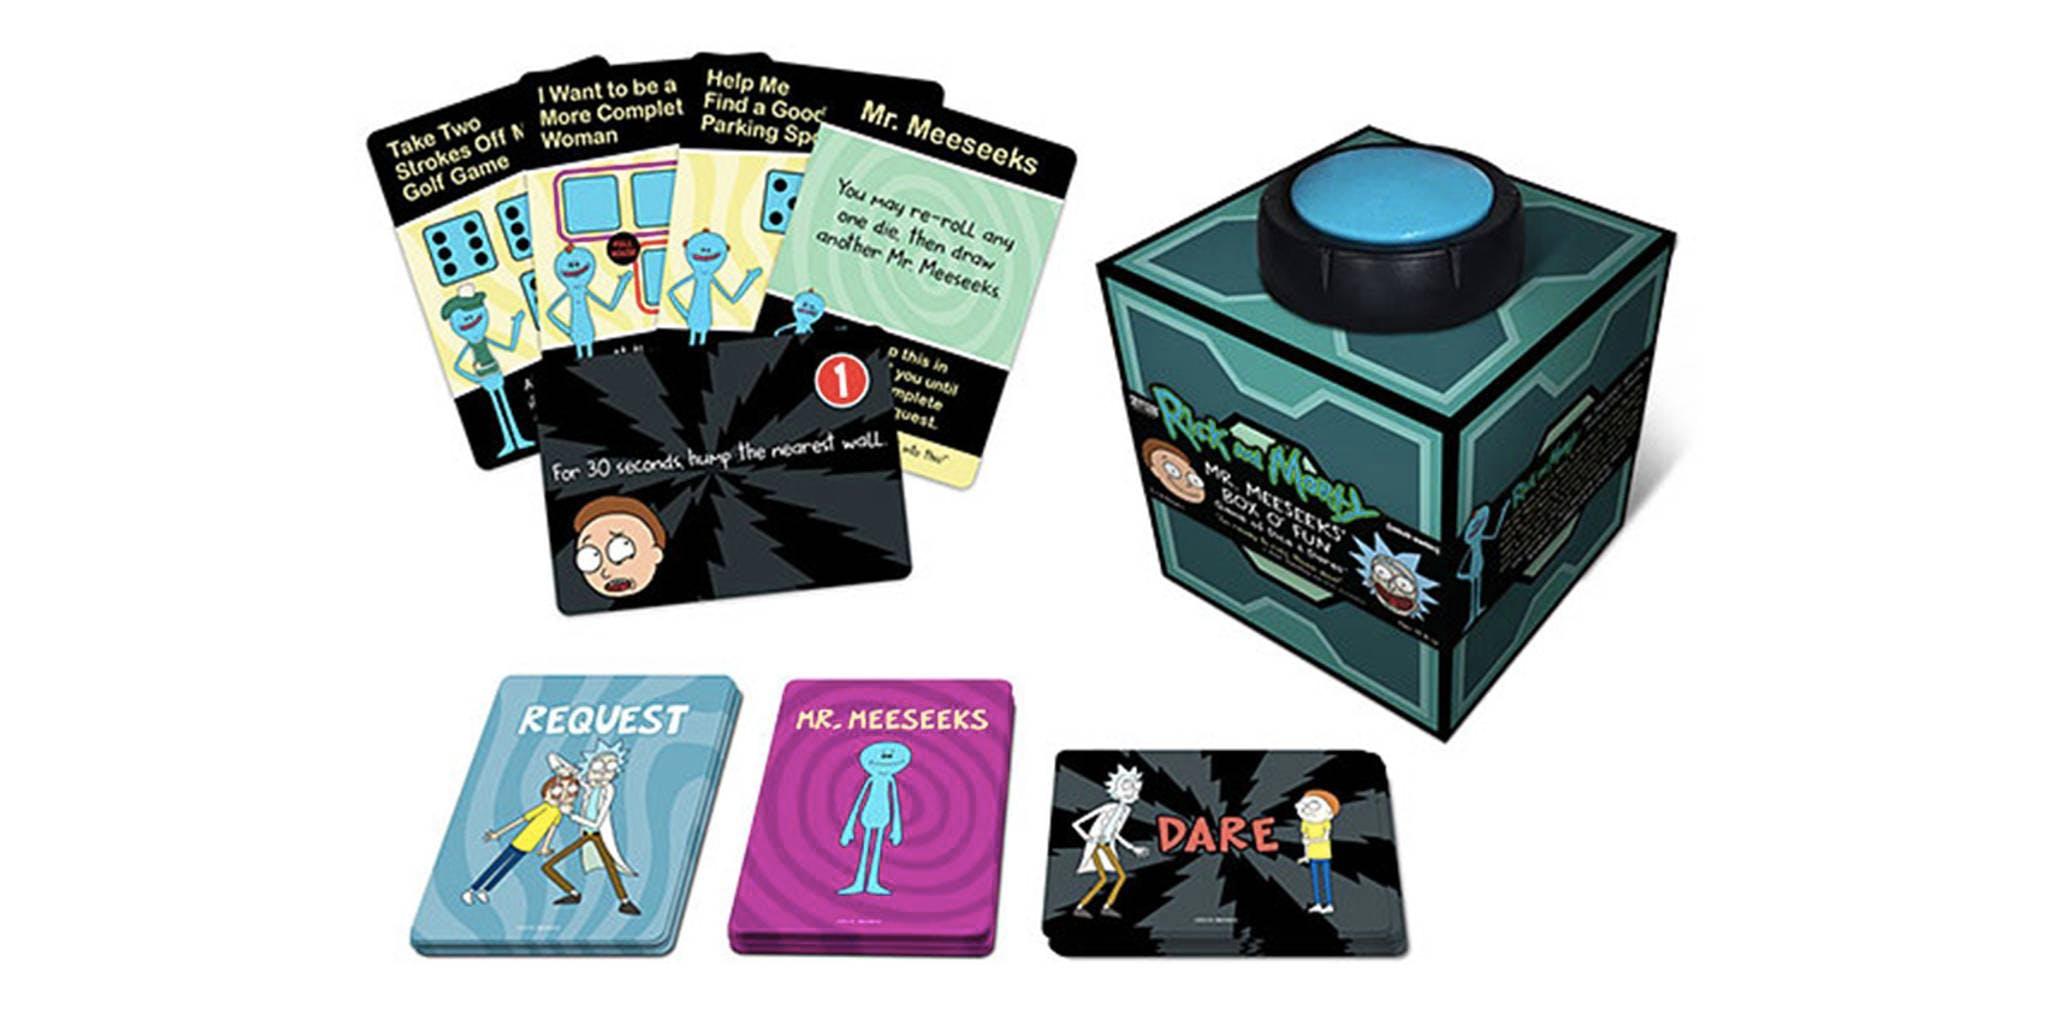 best board games : Rick and Morty Mr. Meeseeks box-o-fun